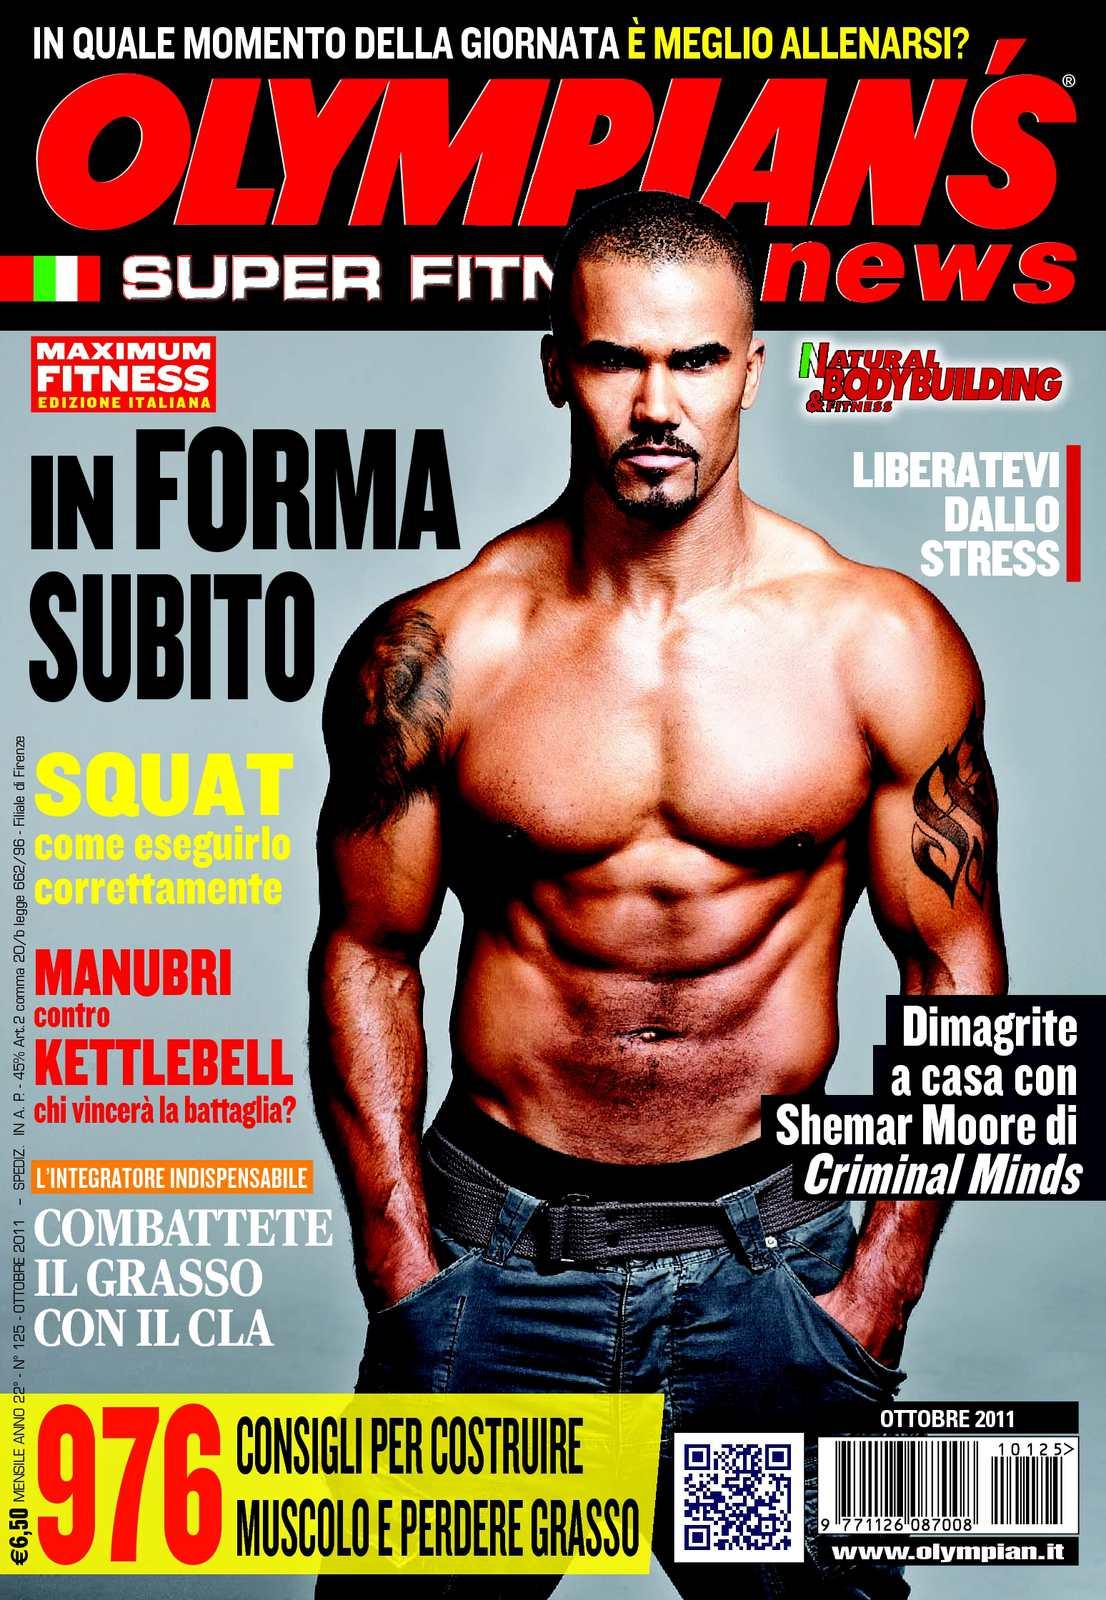 finest selection eb8d0 07be9 Calaméo - Olympian s News e Natural bodybuilding Ottobre 2011